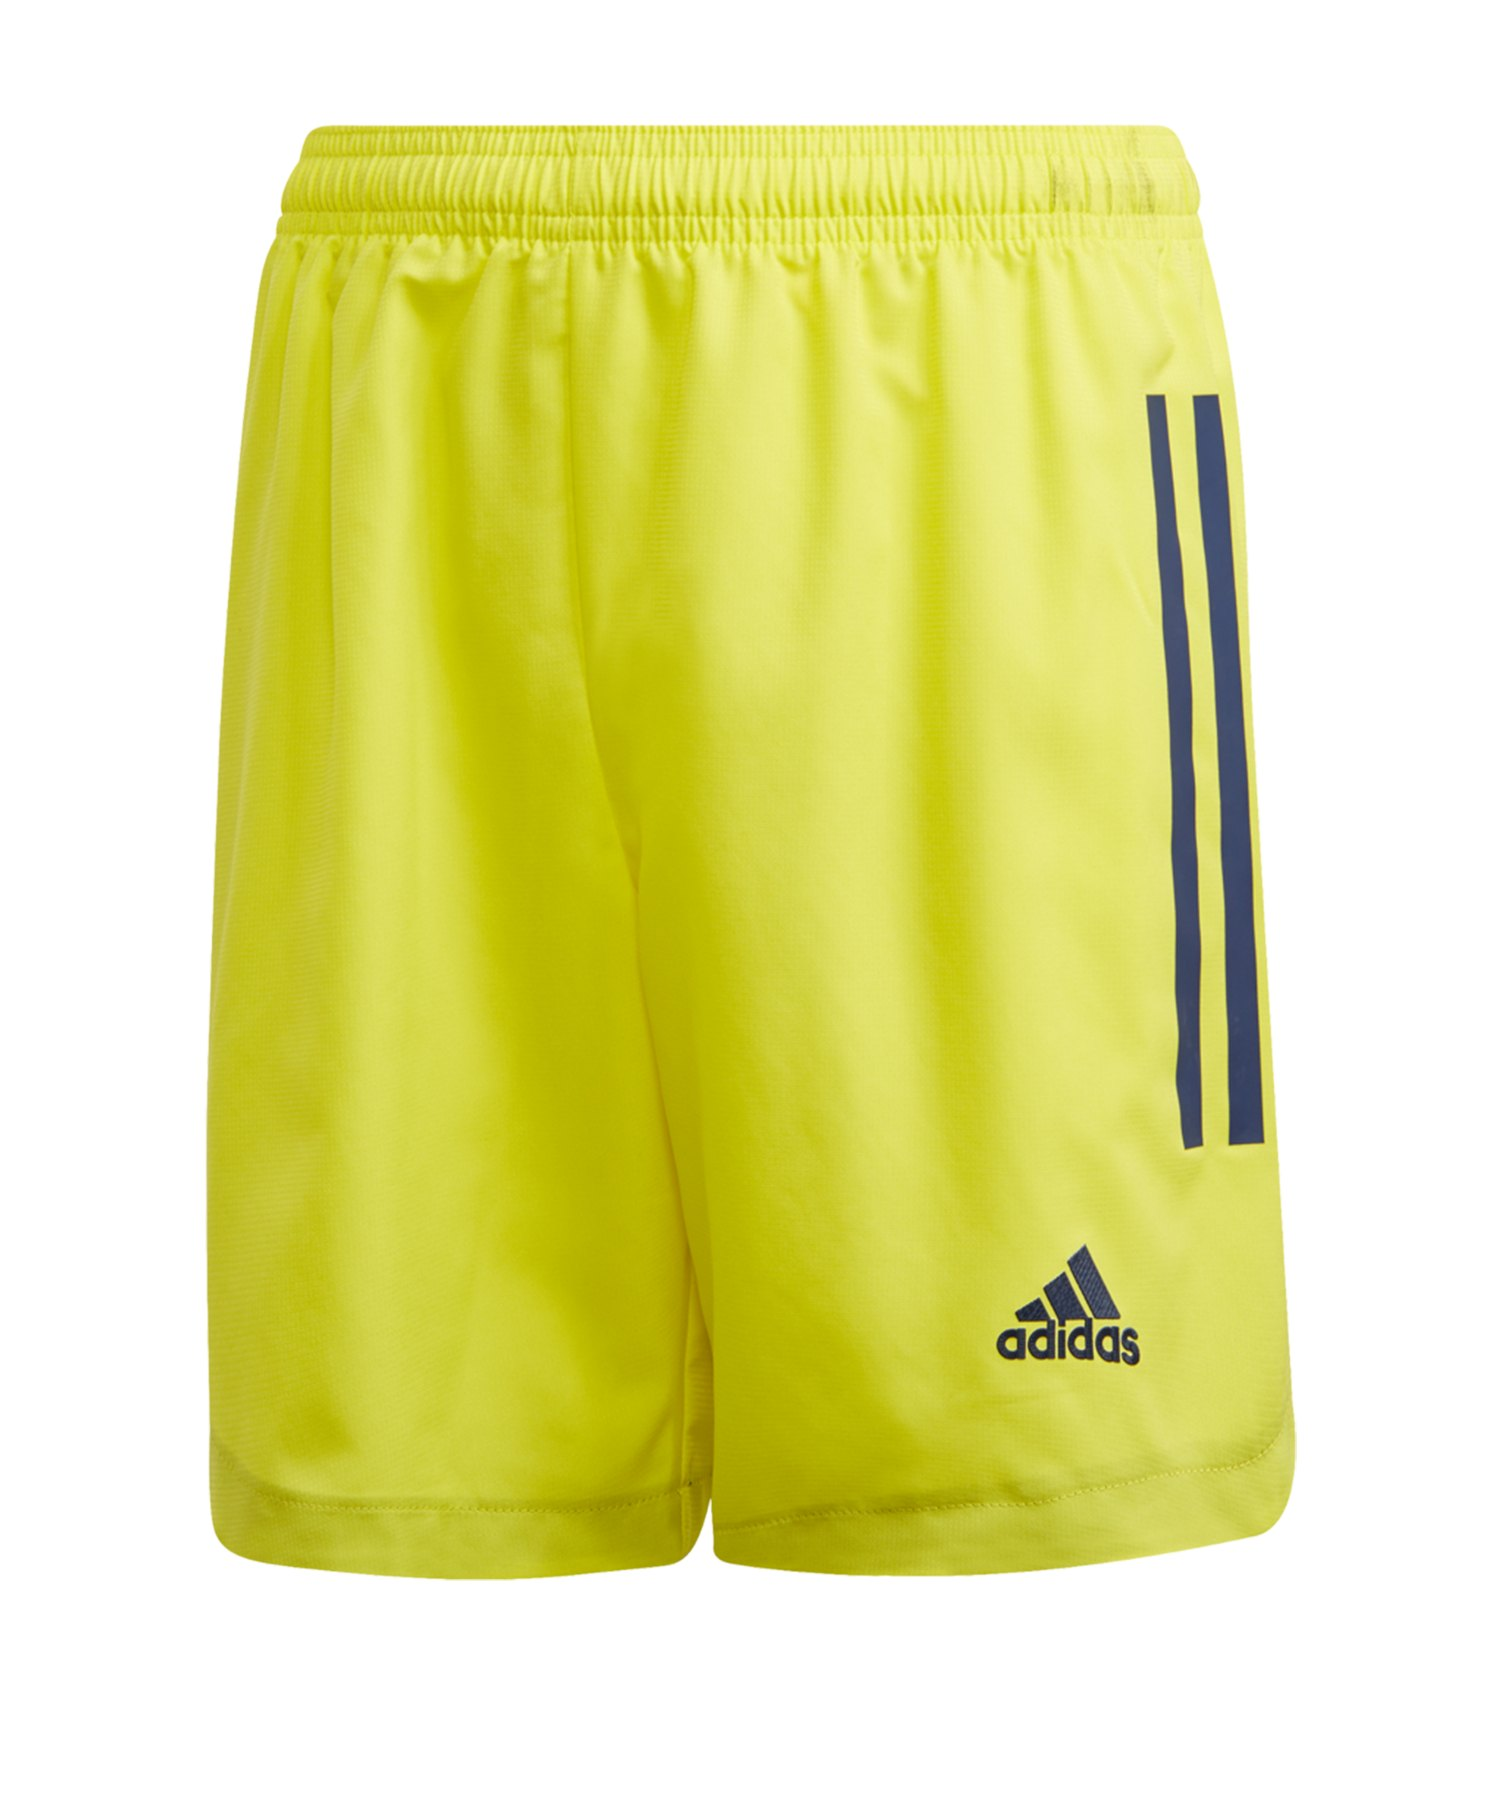 adidas Condivo 20 Short Kids Gelb Blau - gelb